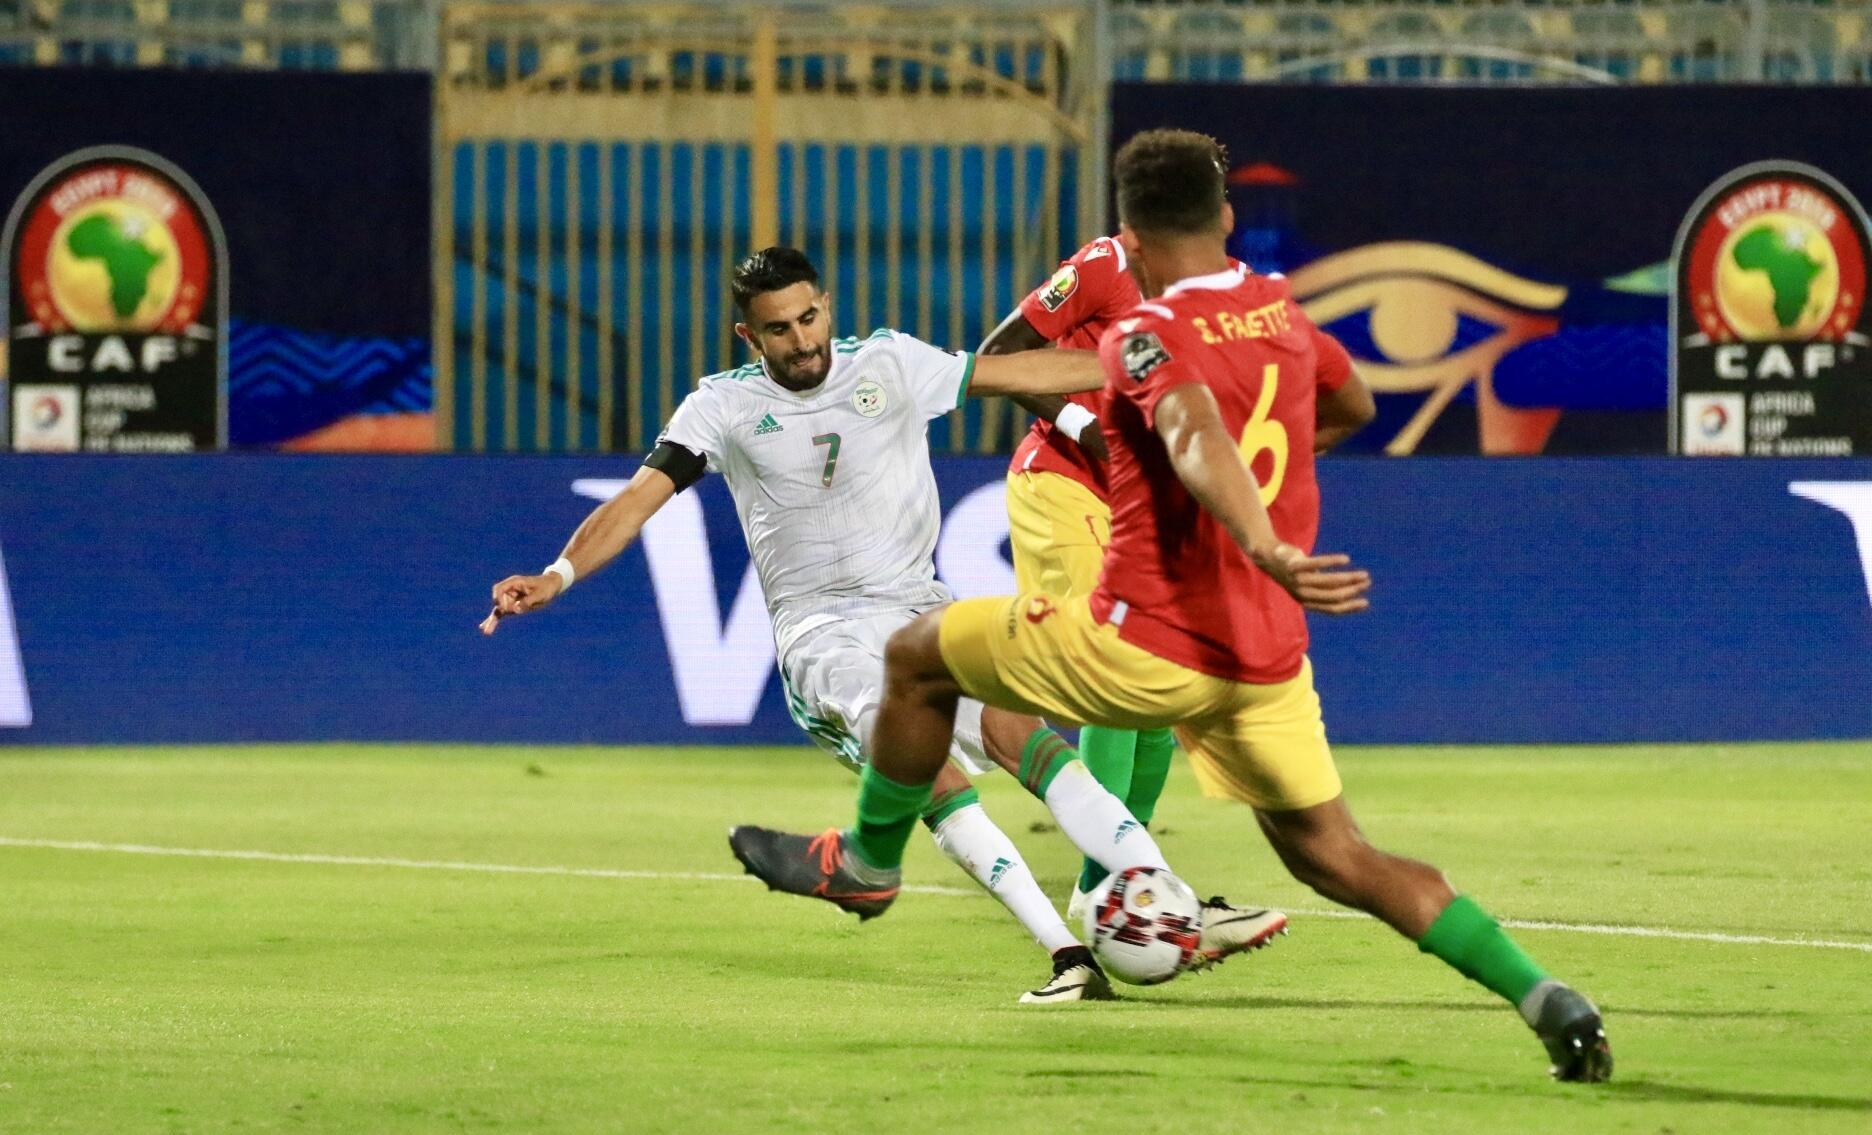 Algeria skipper Riyad Mahrez scored the second of his side's three goals in the victory over Guinea.